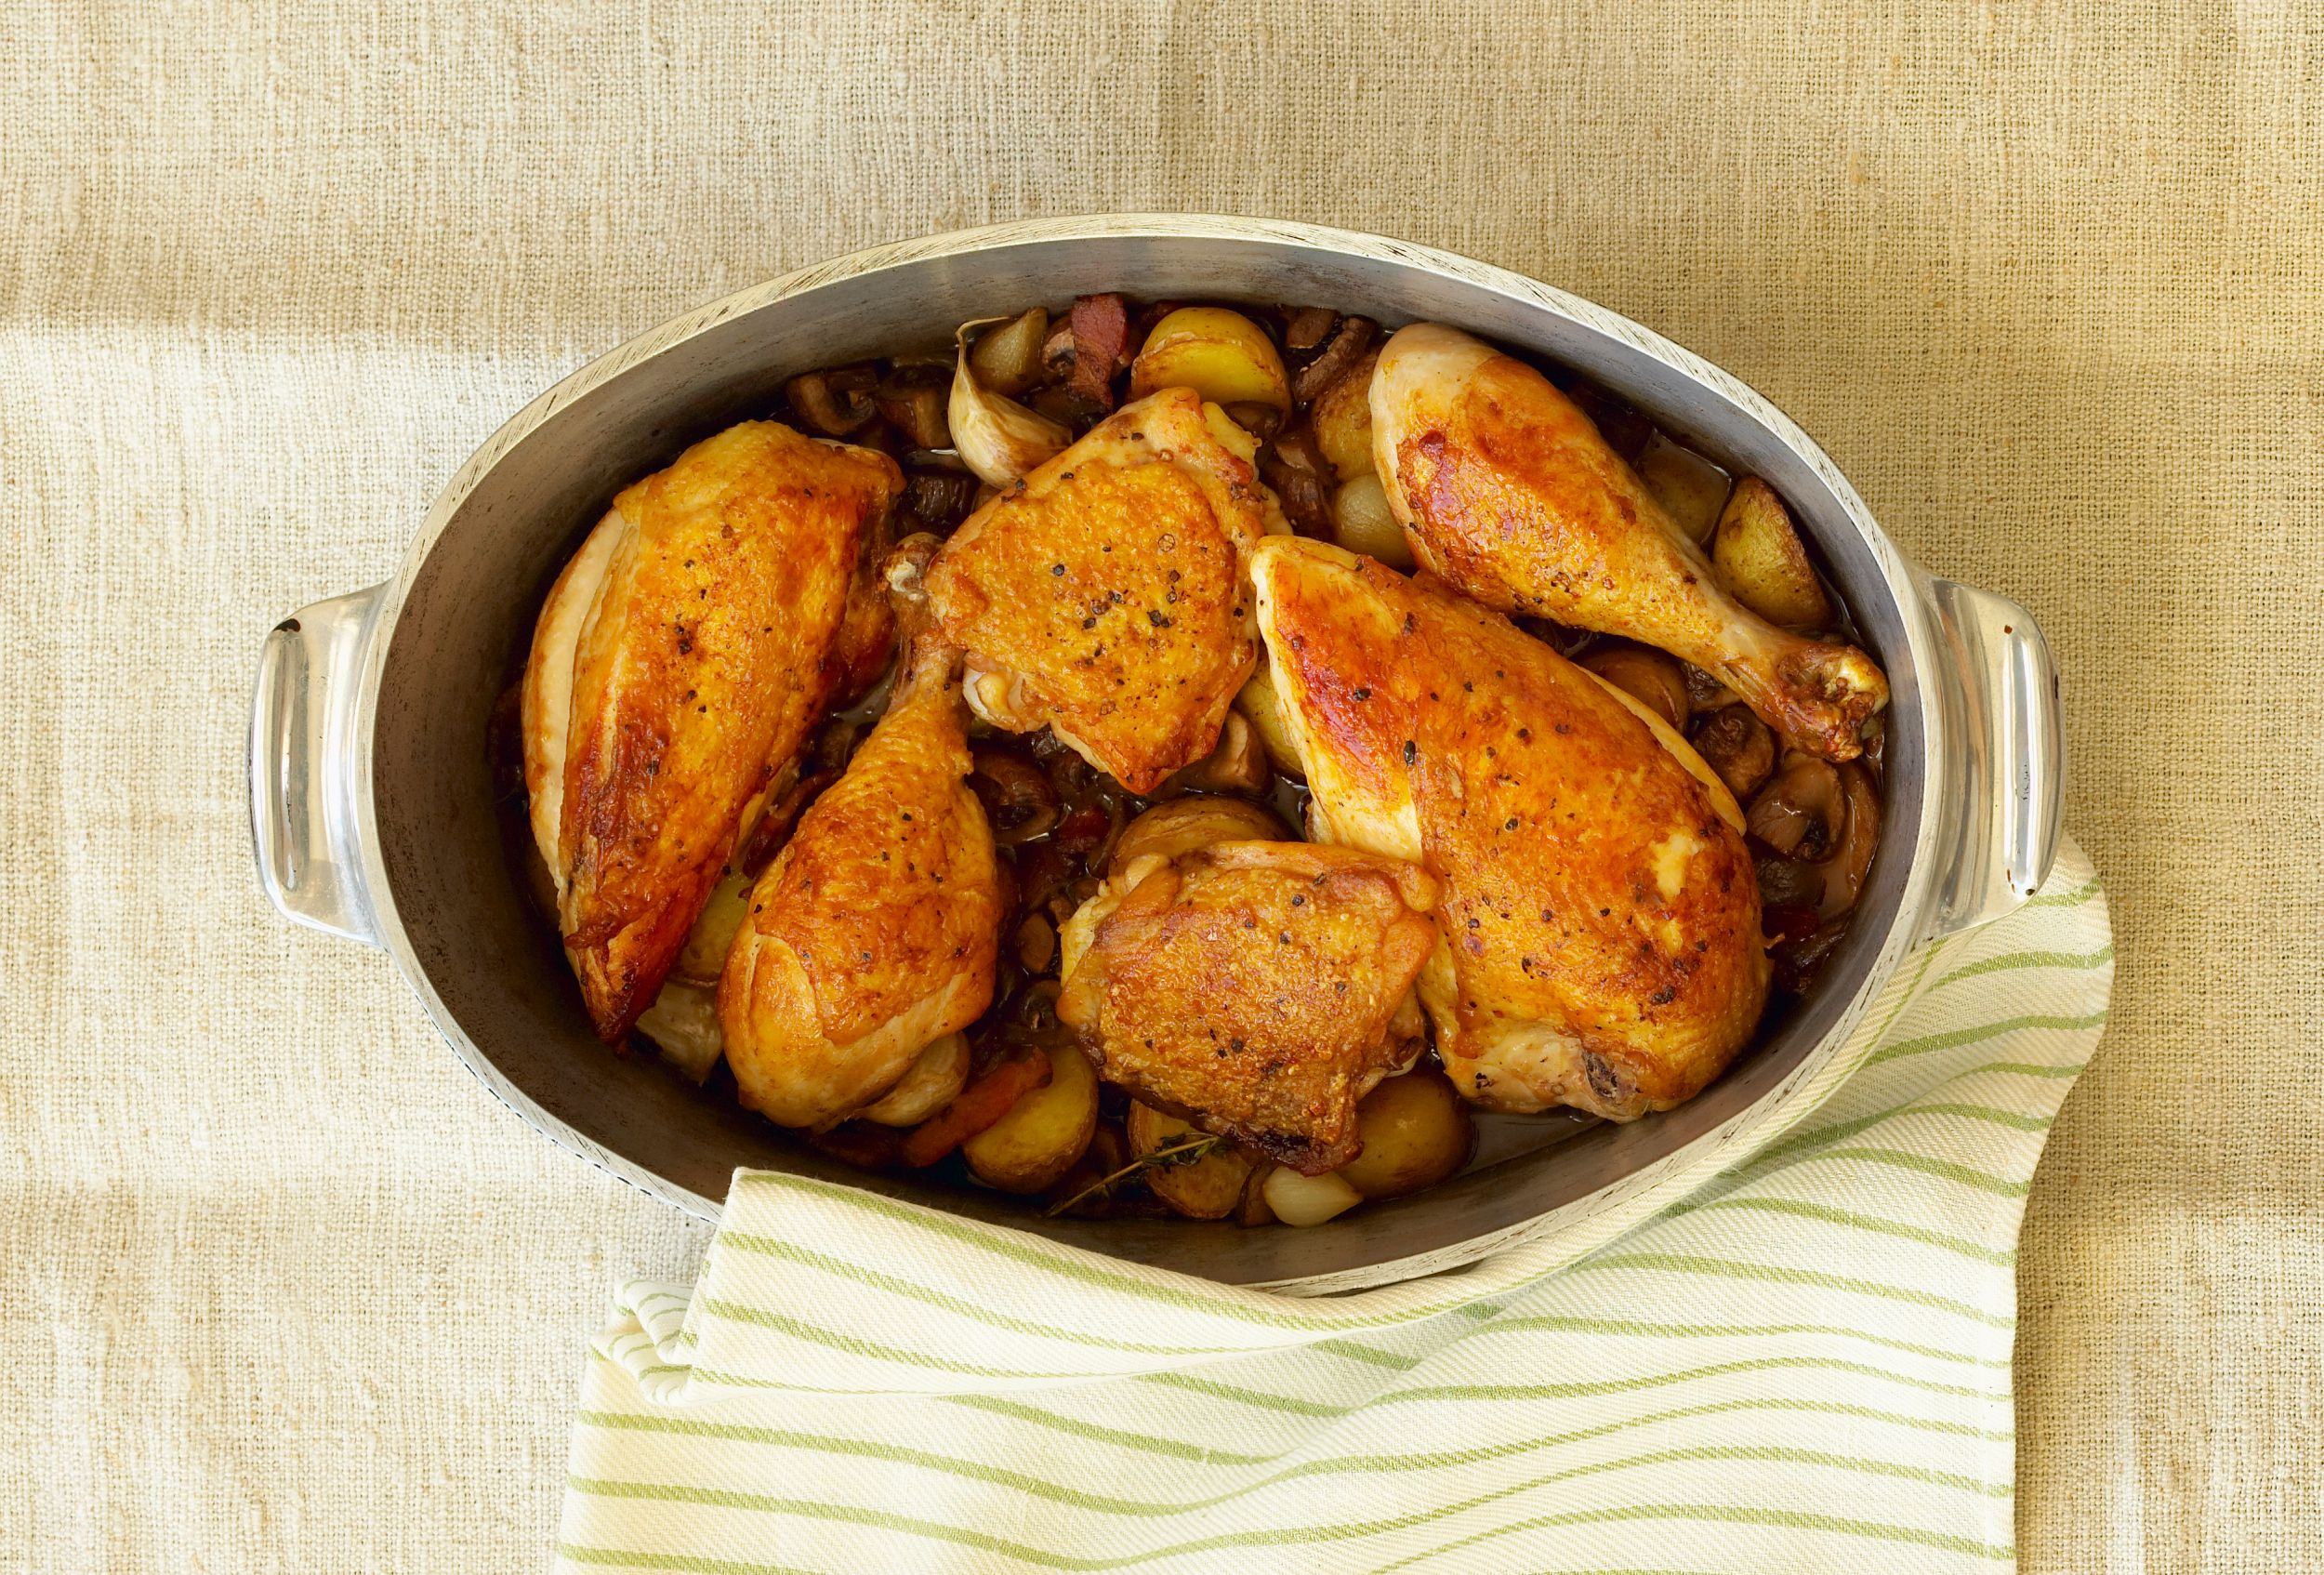 Seasoned Oven Baked Chicken Pieces Recipe